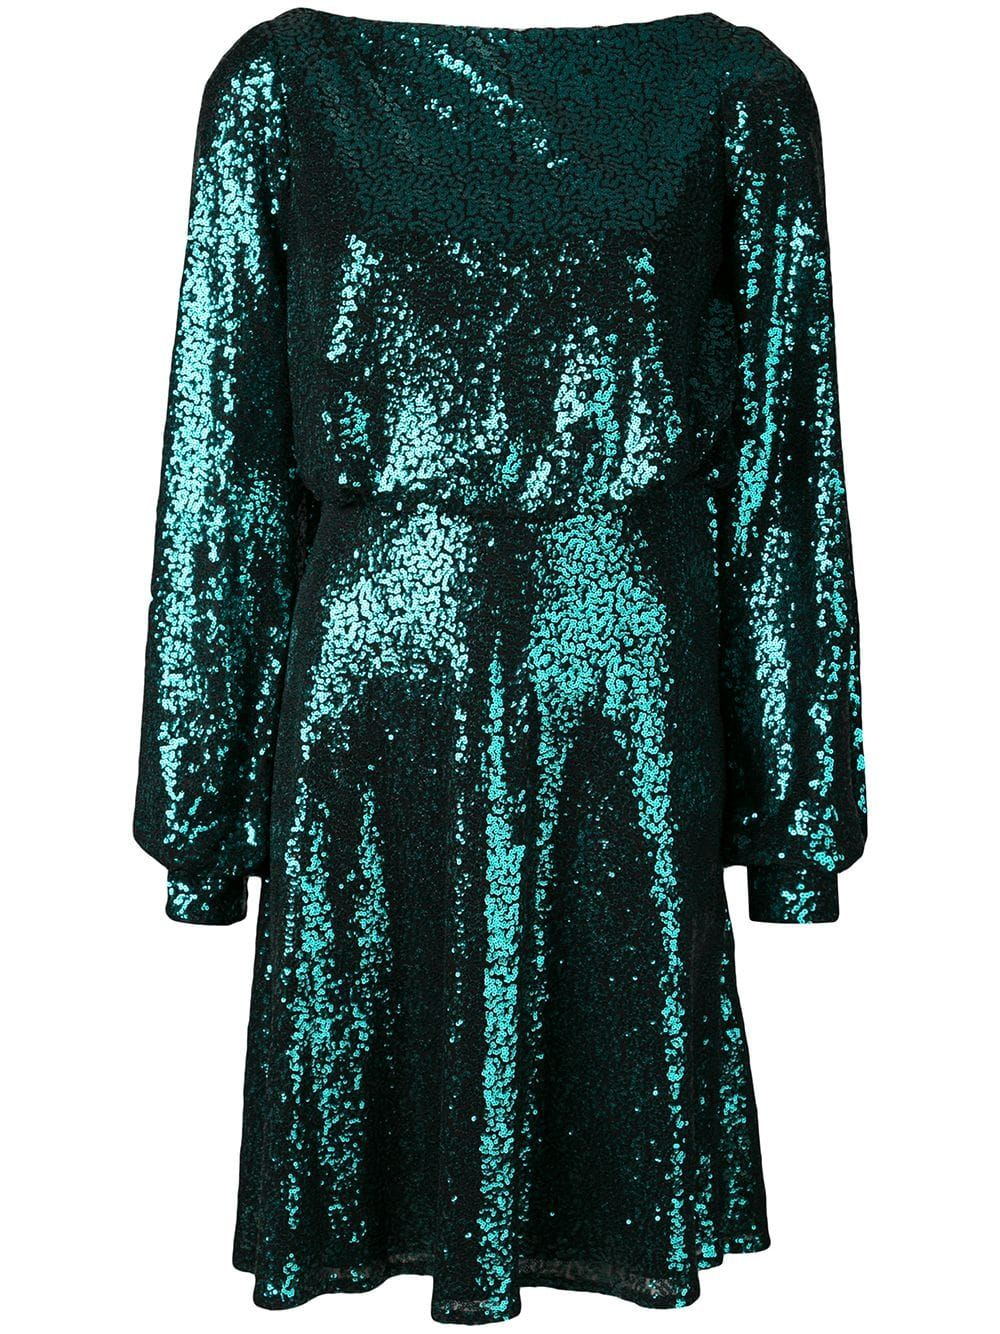 Tadashi Shoji Sequin Dress Designer Cocktail Dress Sequin Dress Dresses [ 1334 x 1000 Pixel ]